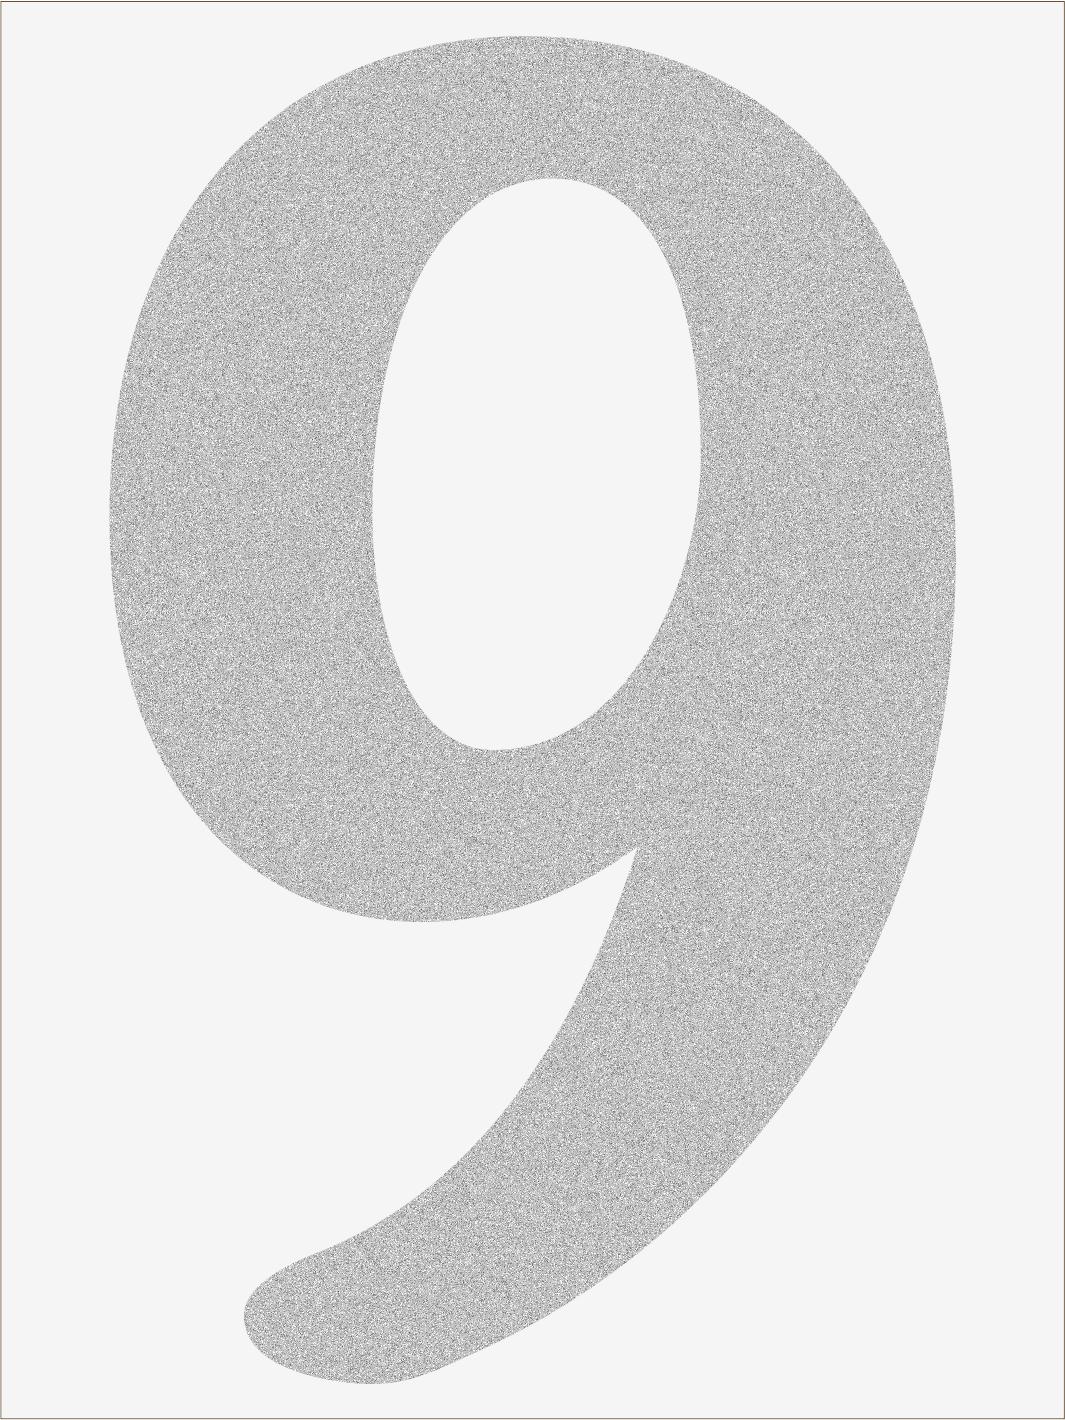 Číslica 9 font1